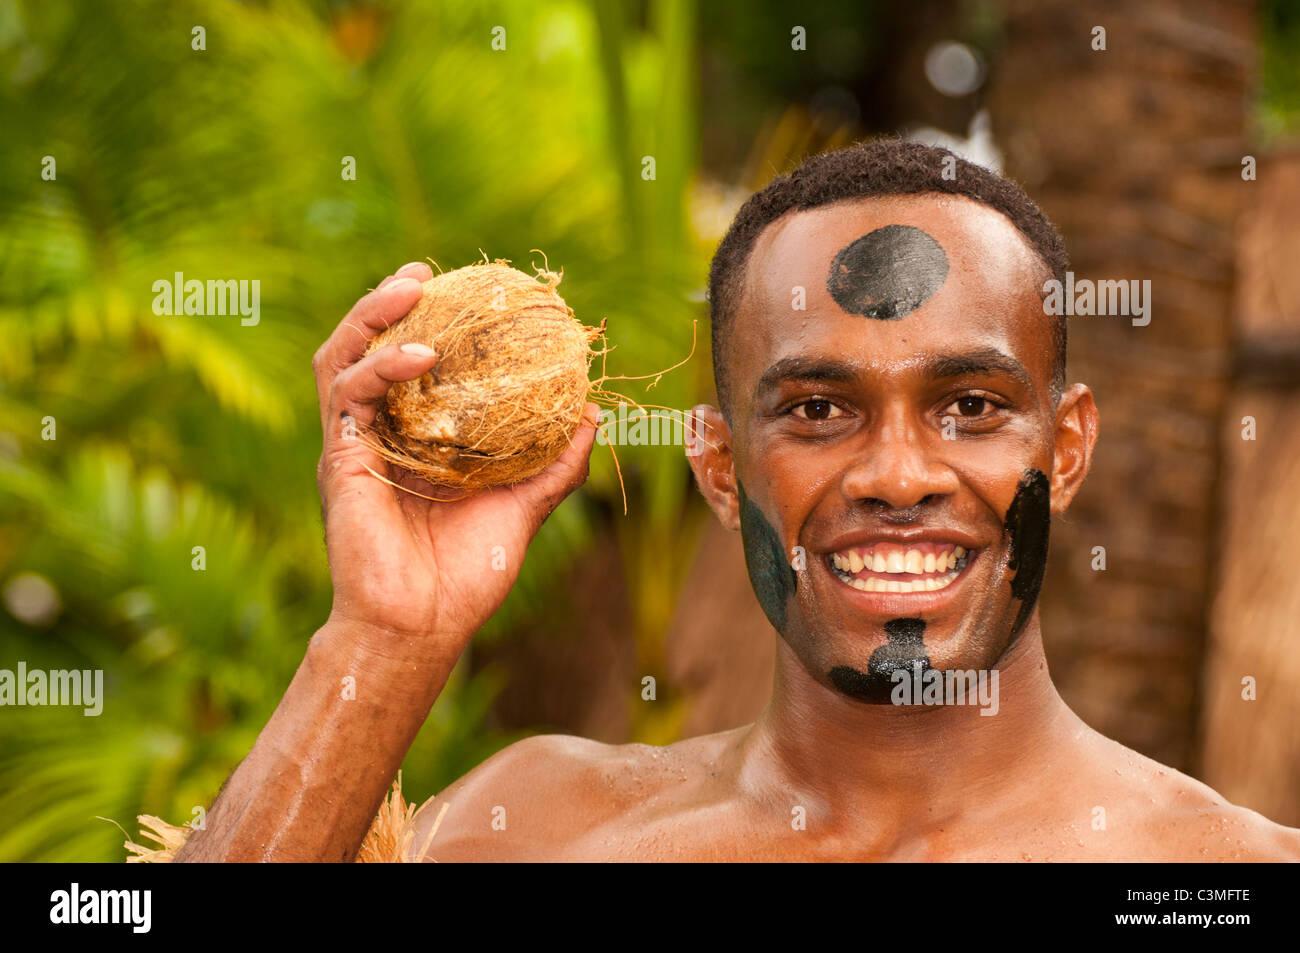 Tradtional Fijian warrior performs cermony with mature coconuts, Castaways Resort, Qalito Island, Mamanucas, Fiji - Stock Image